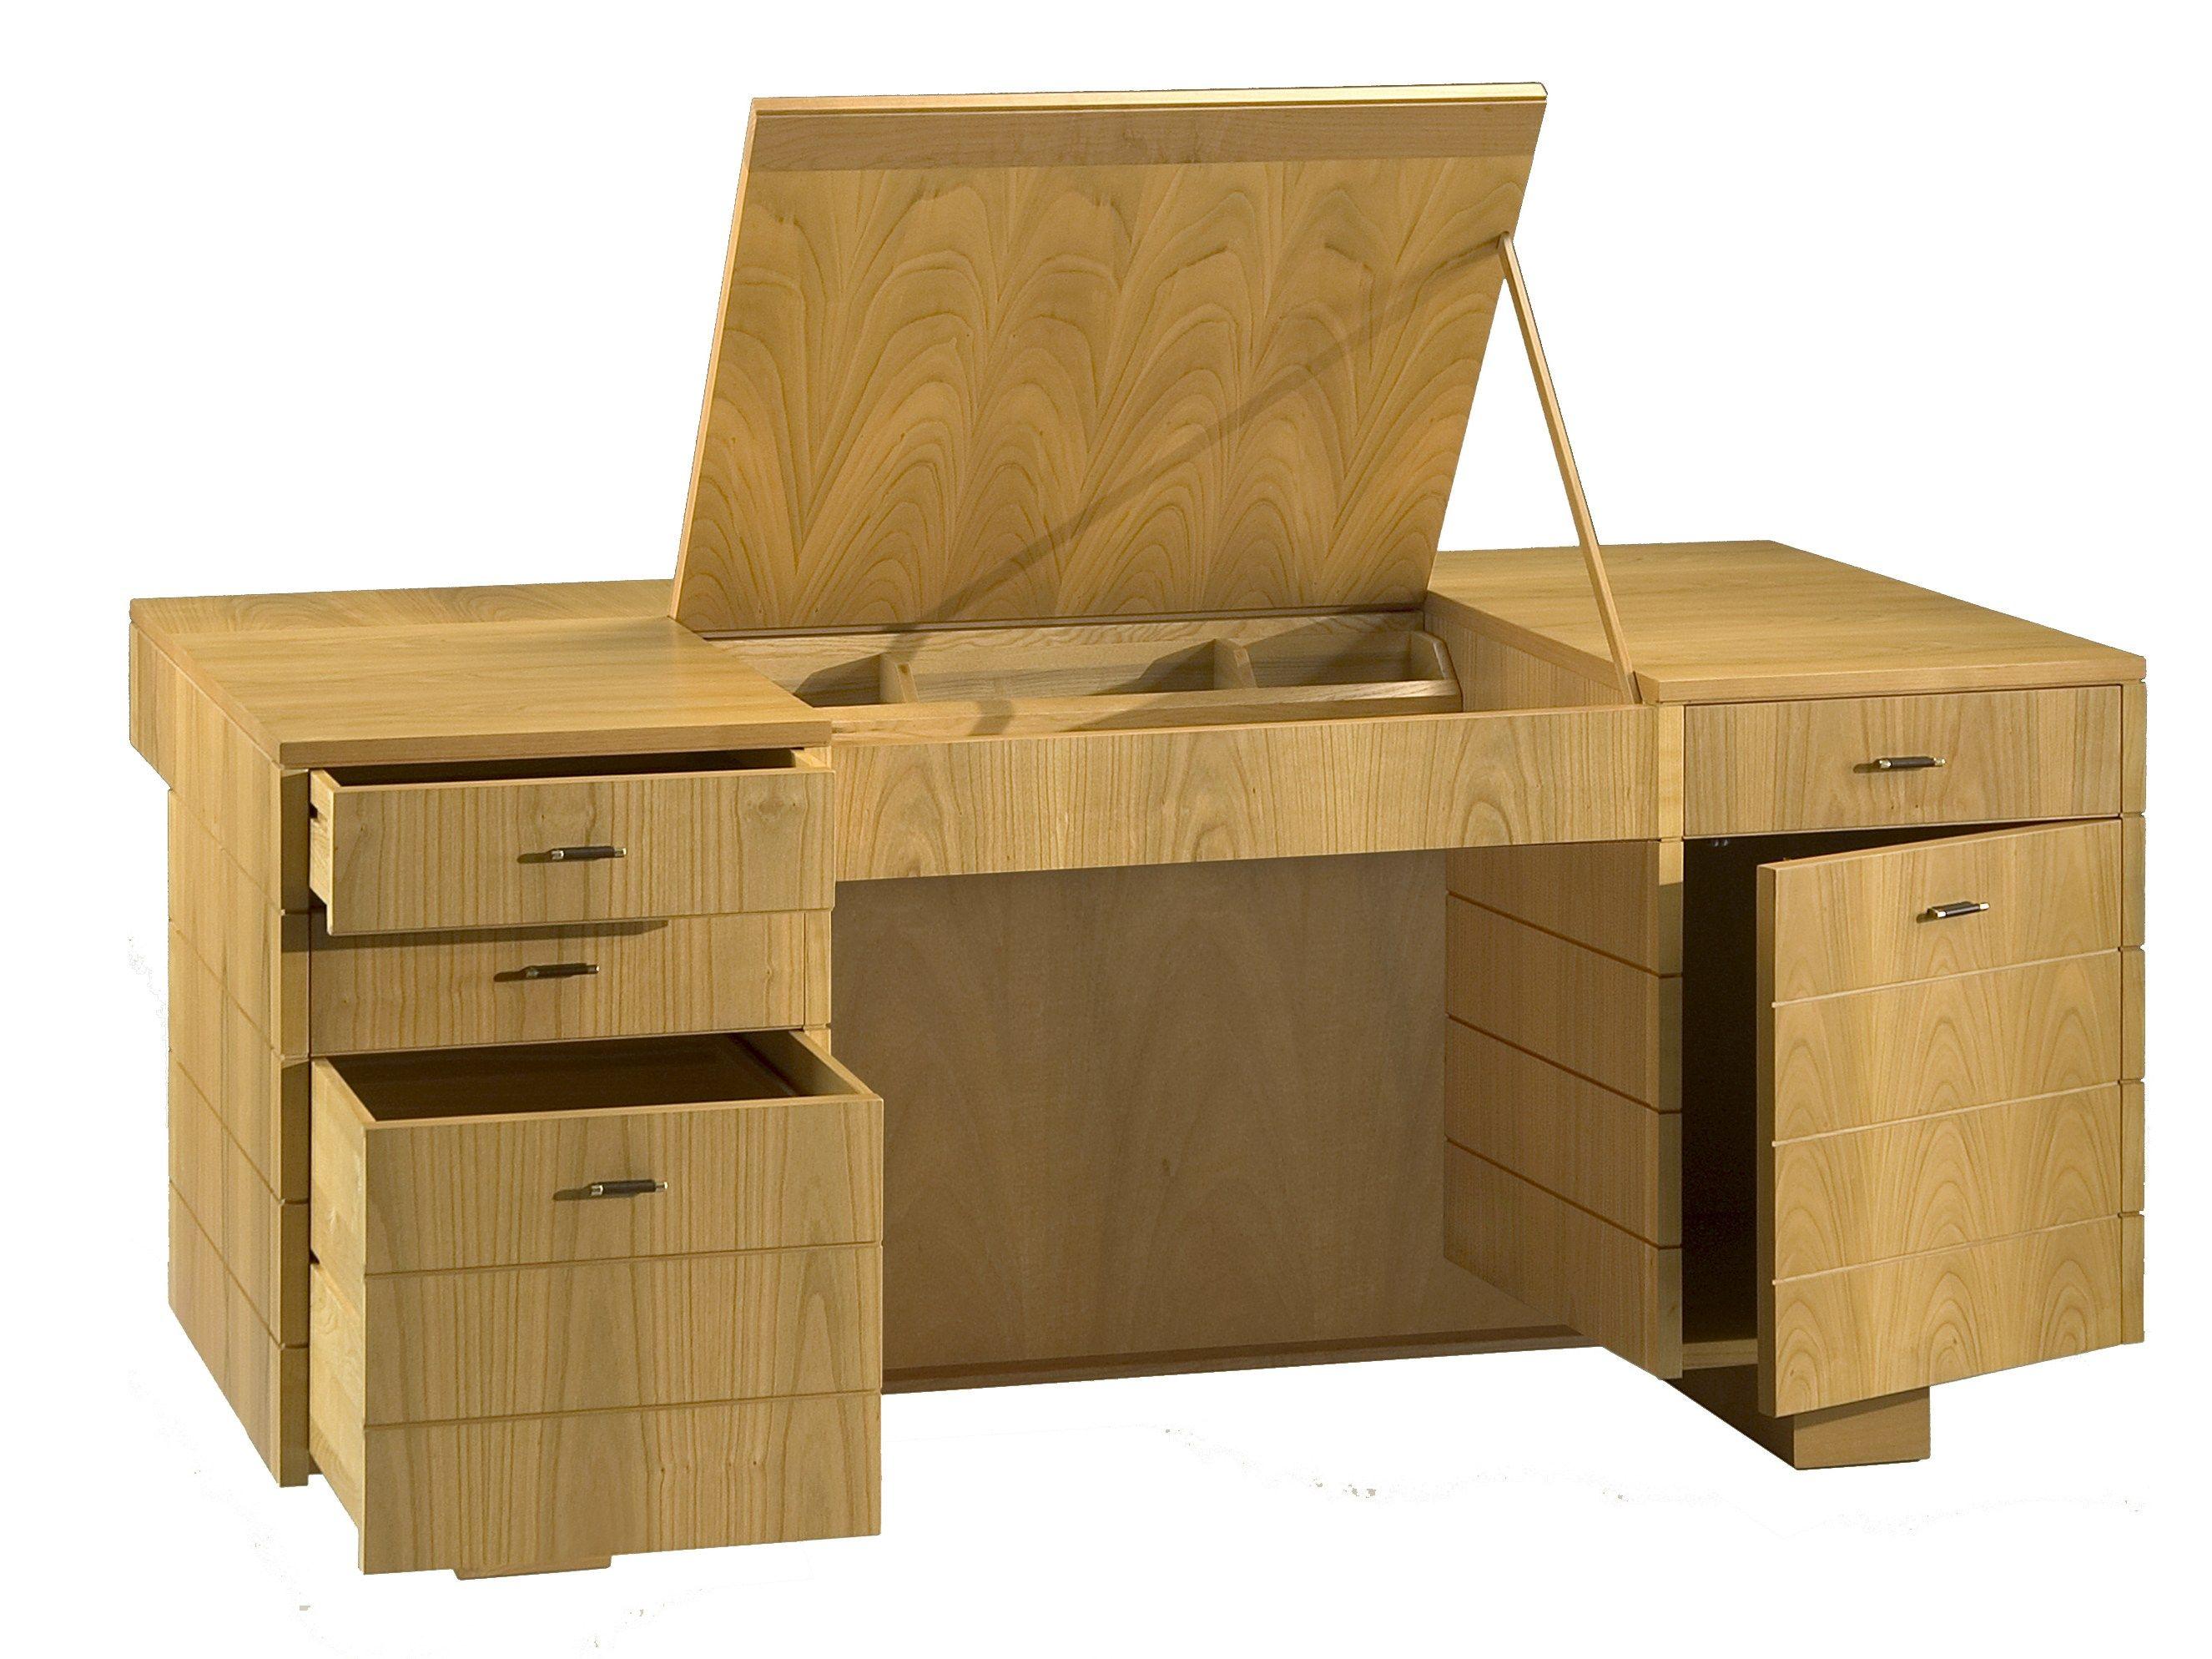 Ikea Tavoli Con Ribalta  madgeweb.com idee di interior design